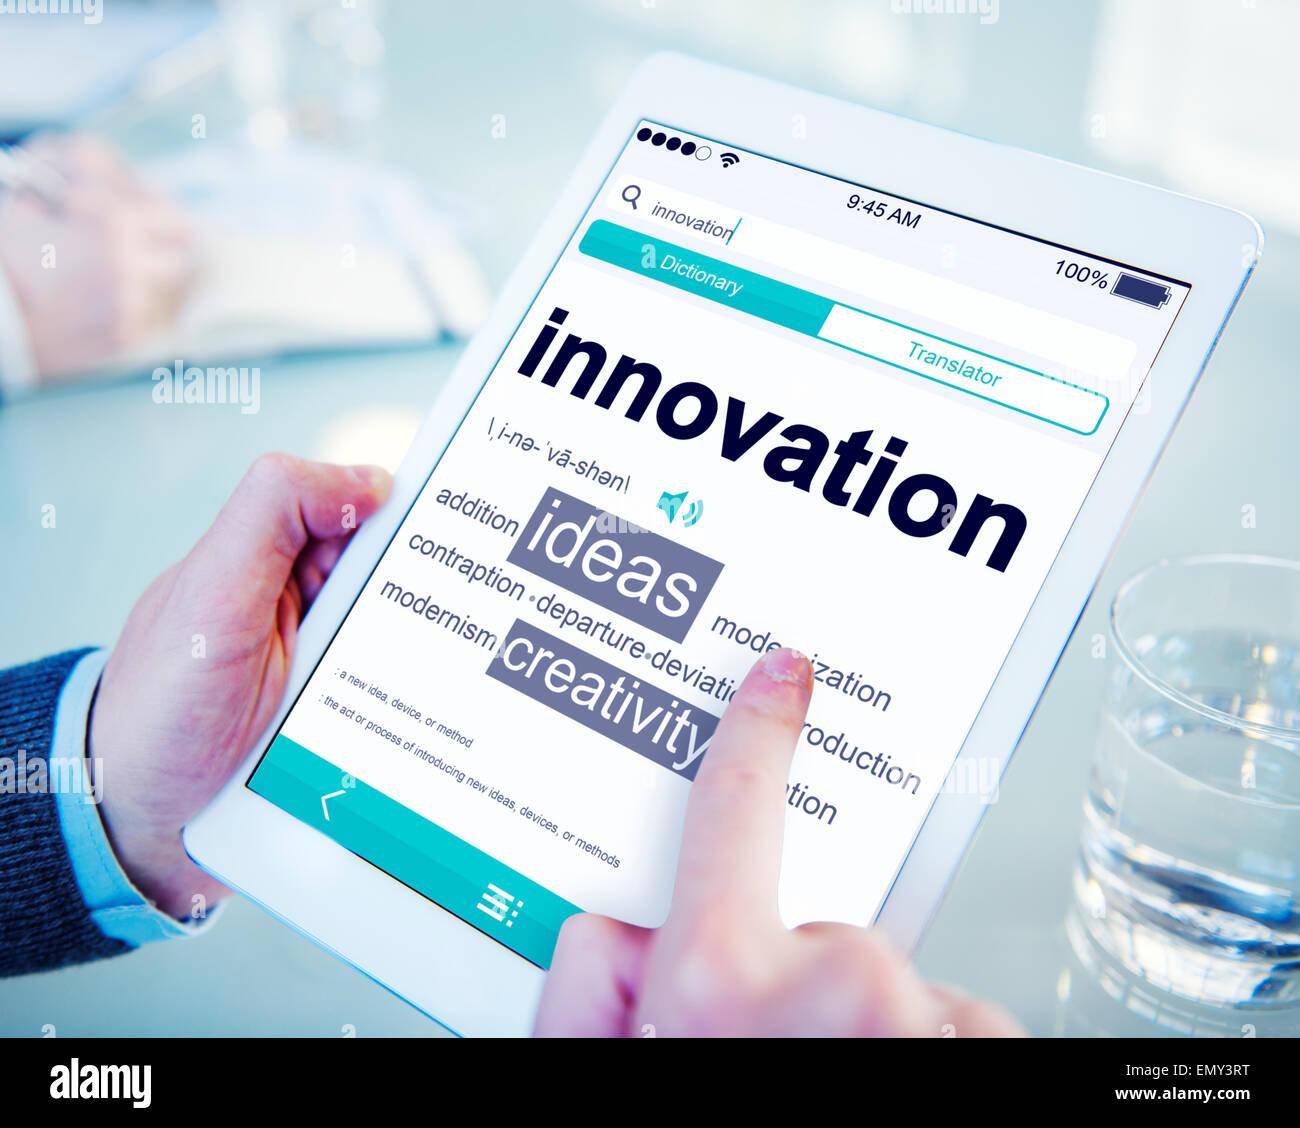 Digital Dictionary Innovation Ideas Creativity Concept - Stock Image